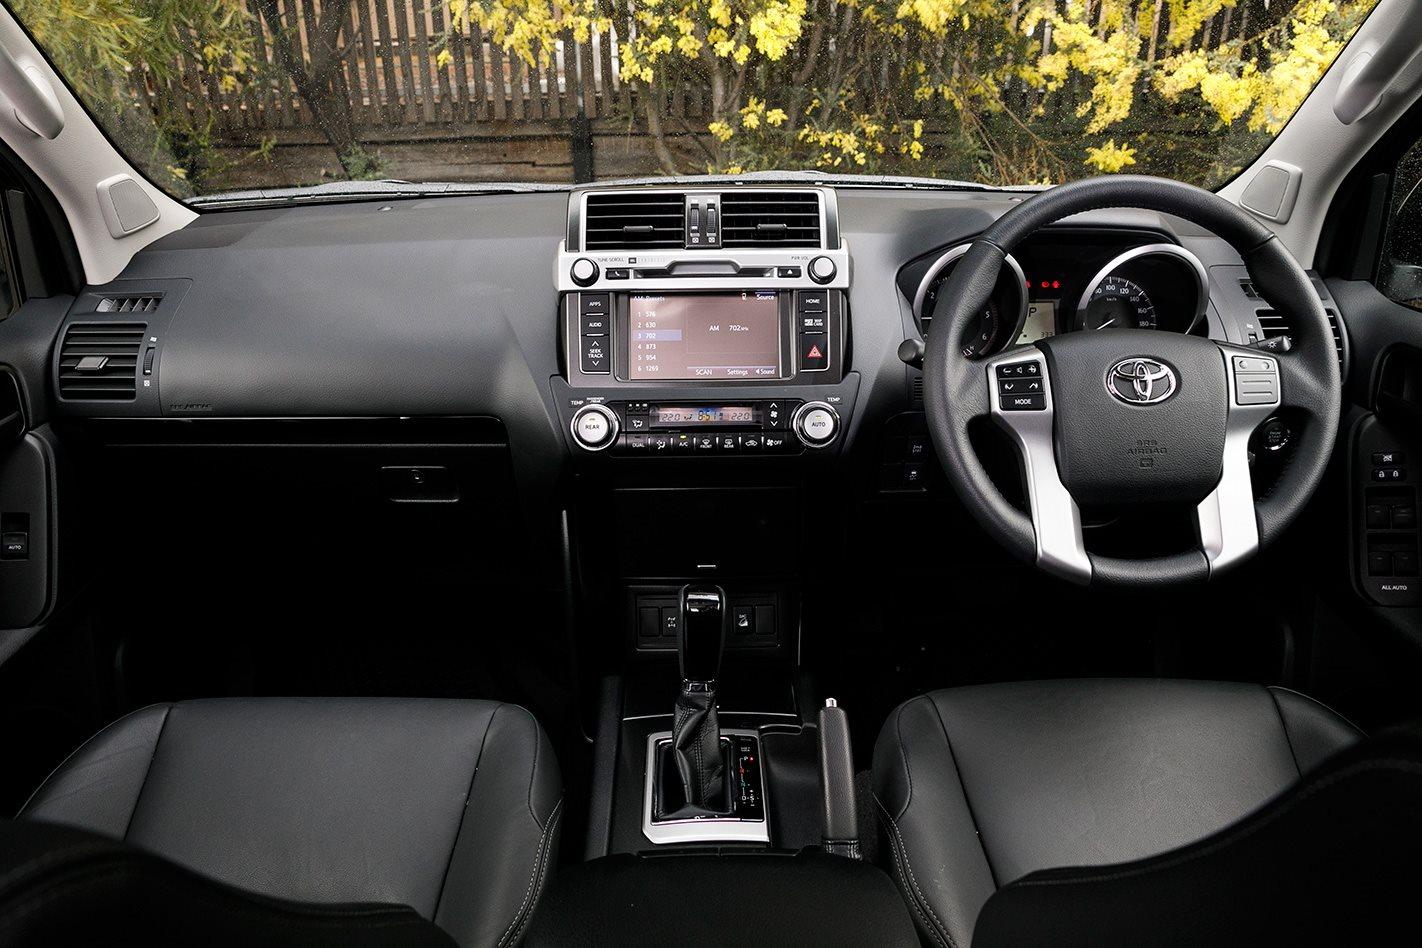 2017 Toyota LandCruiser Prado cabin.jpg